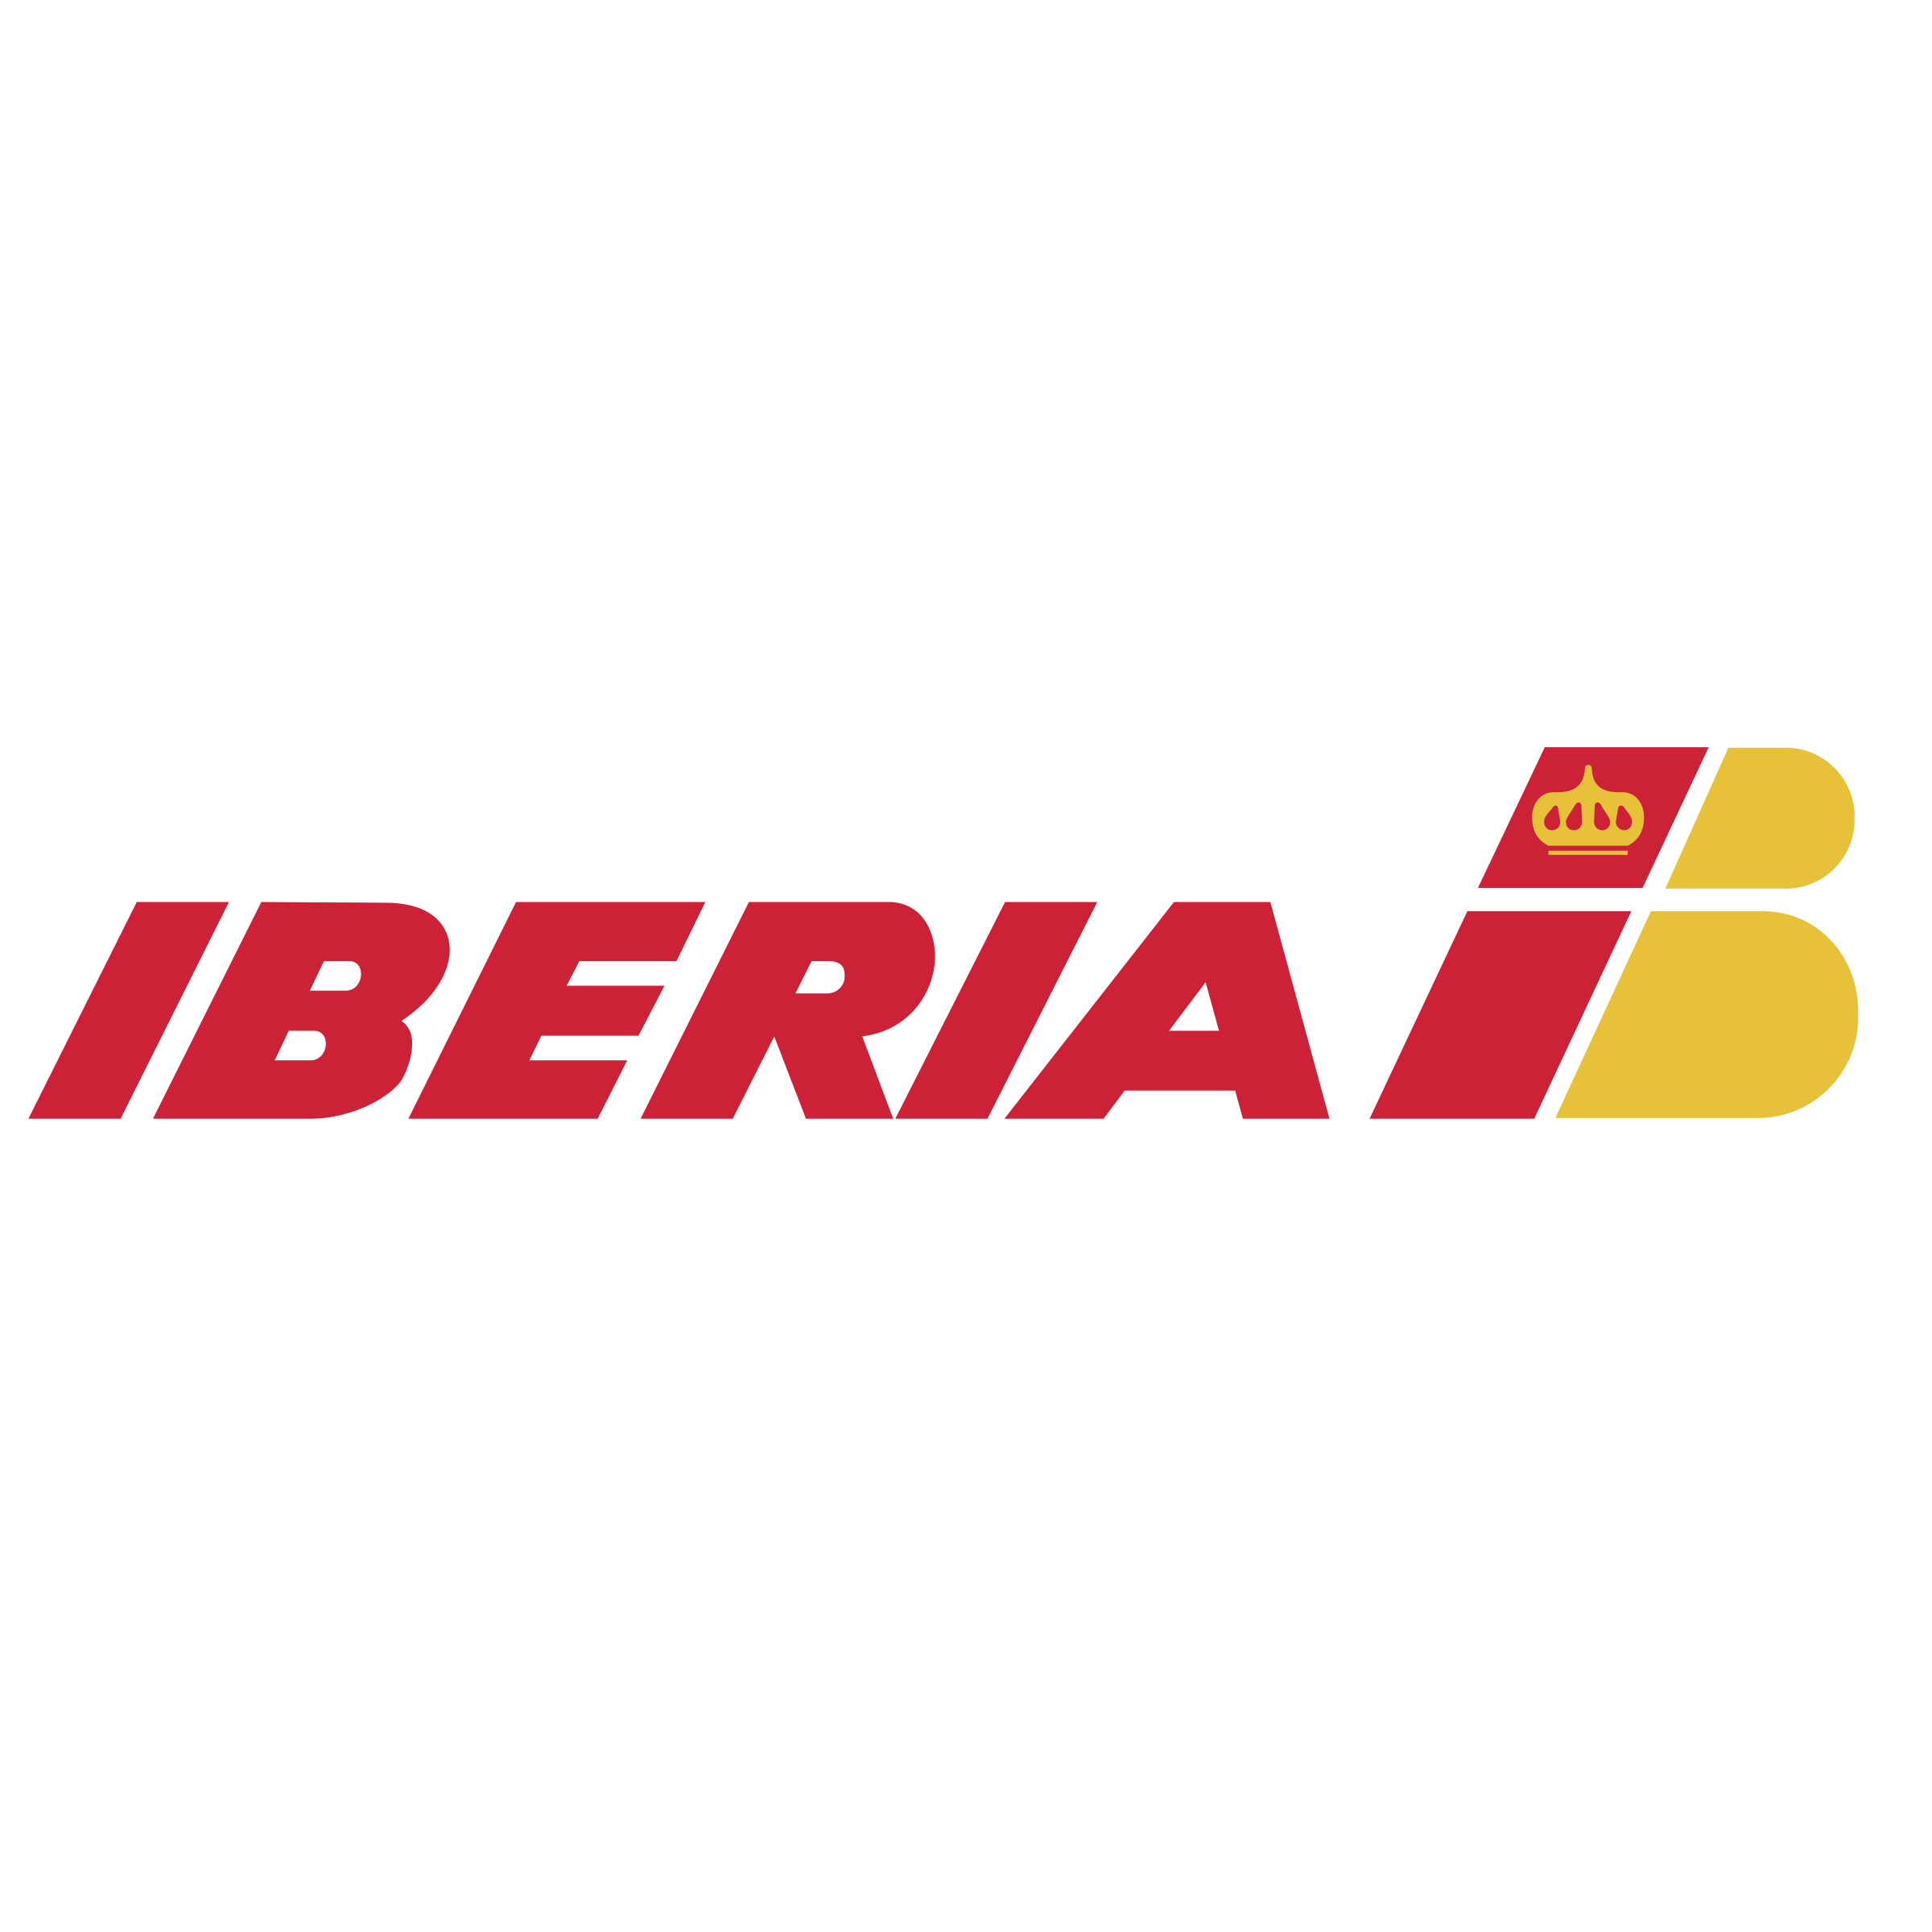 Iberia Airlines Logo PNG Transparent & SVG Vector.